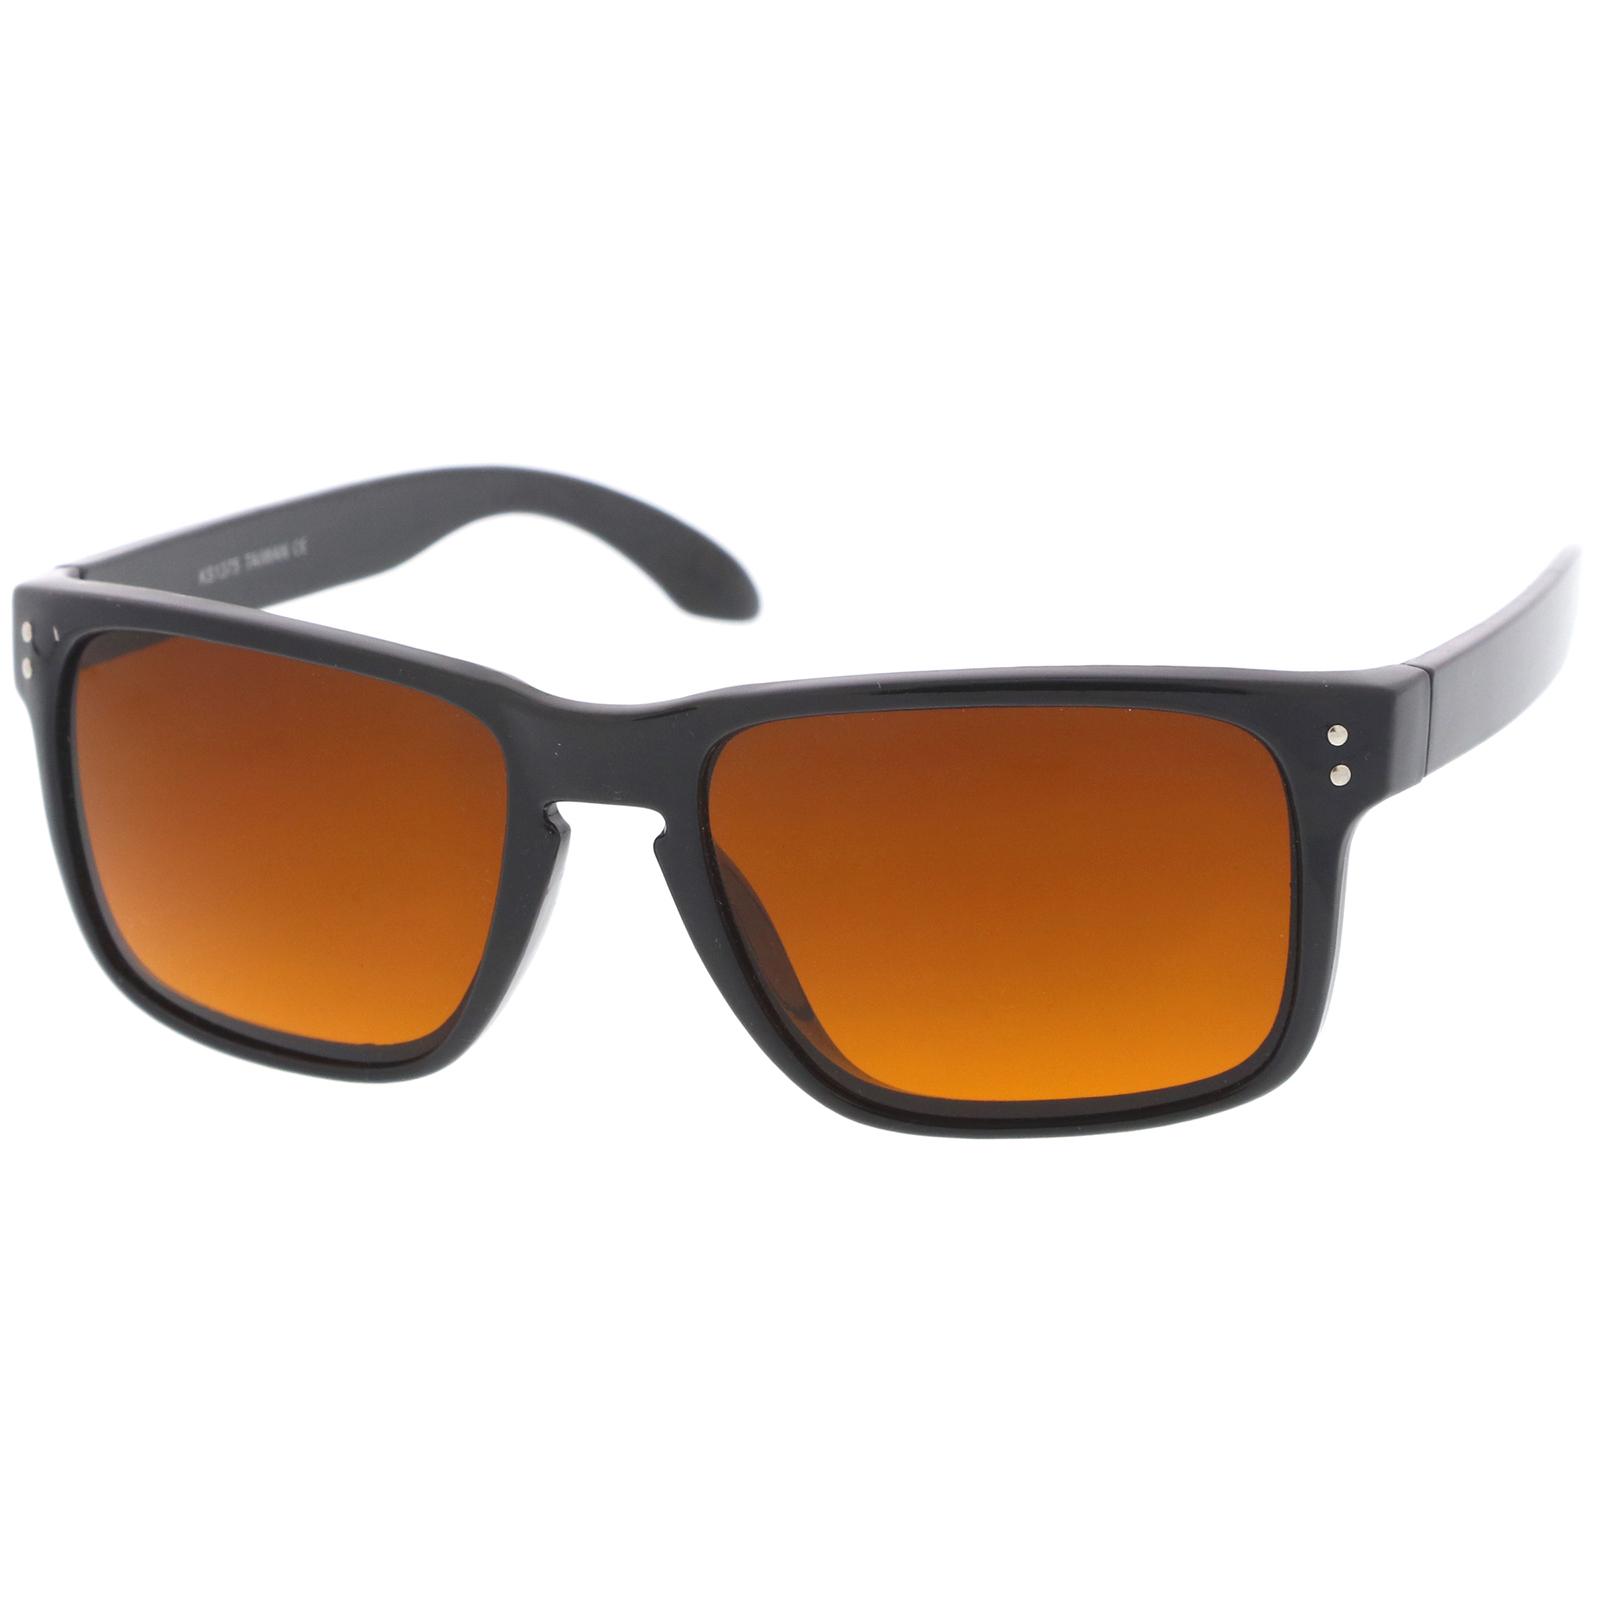 Blue Blocker Sunglasses 101